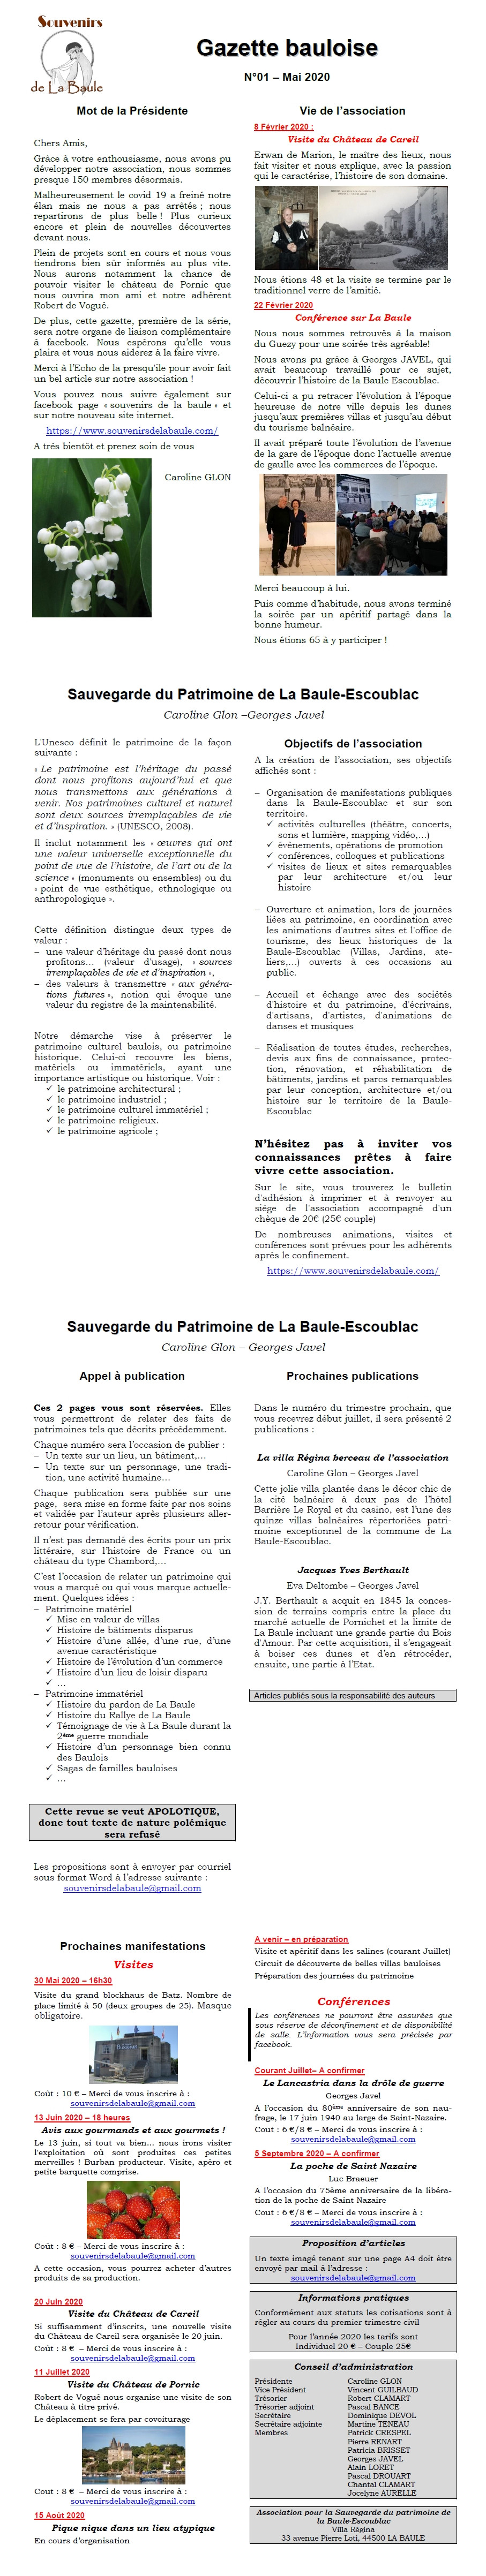 LA GAZETTE BAULOISE 001 - MAI 2020.jpg